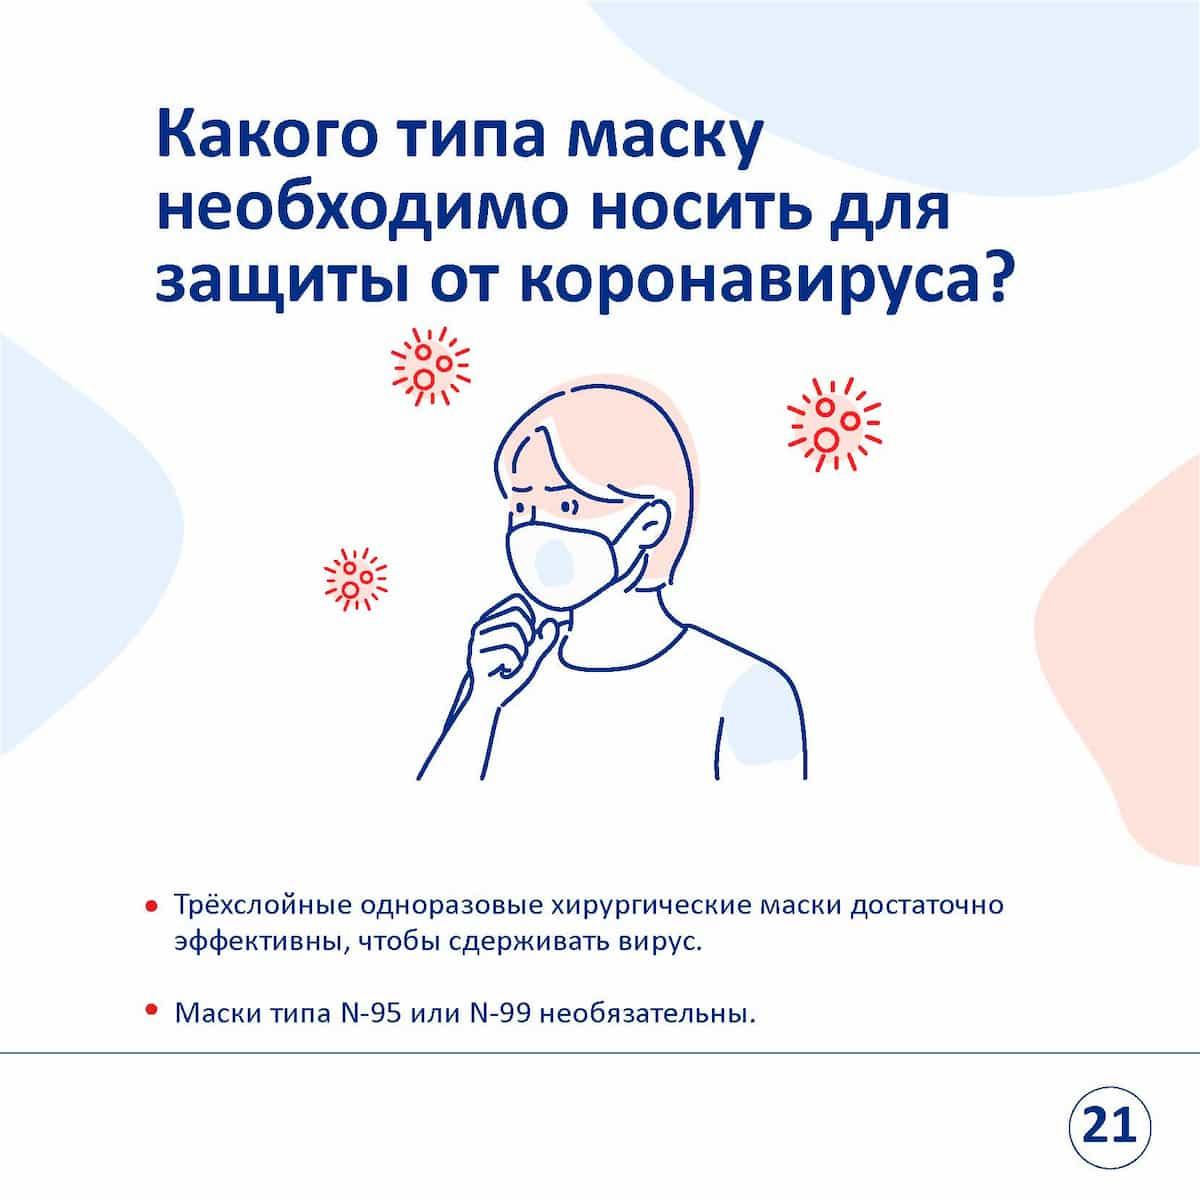 тип масок защищающих от коронавируса